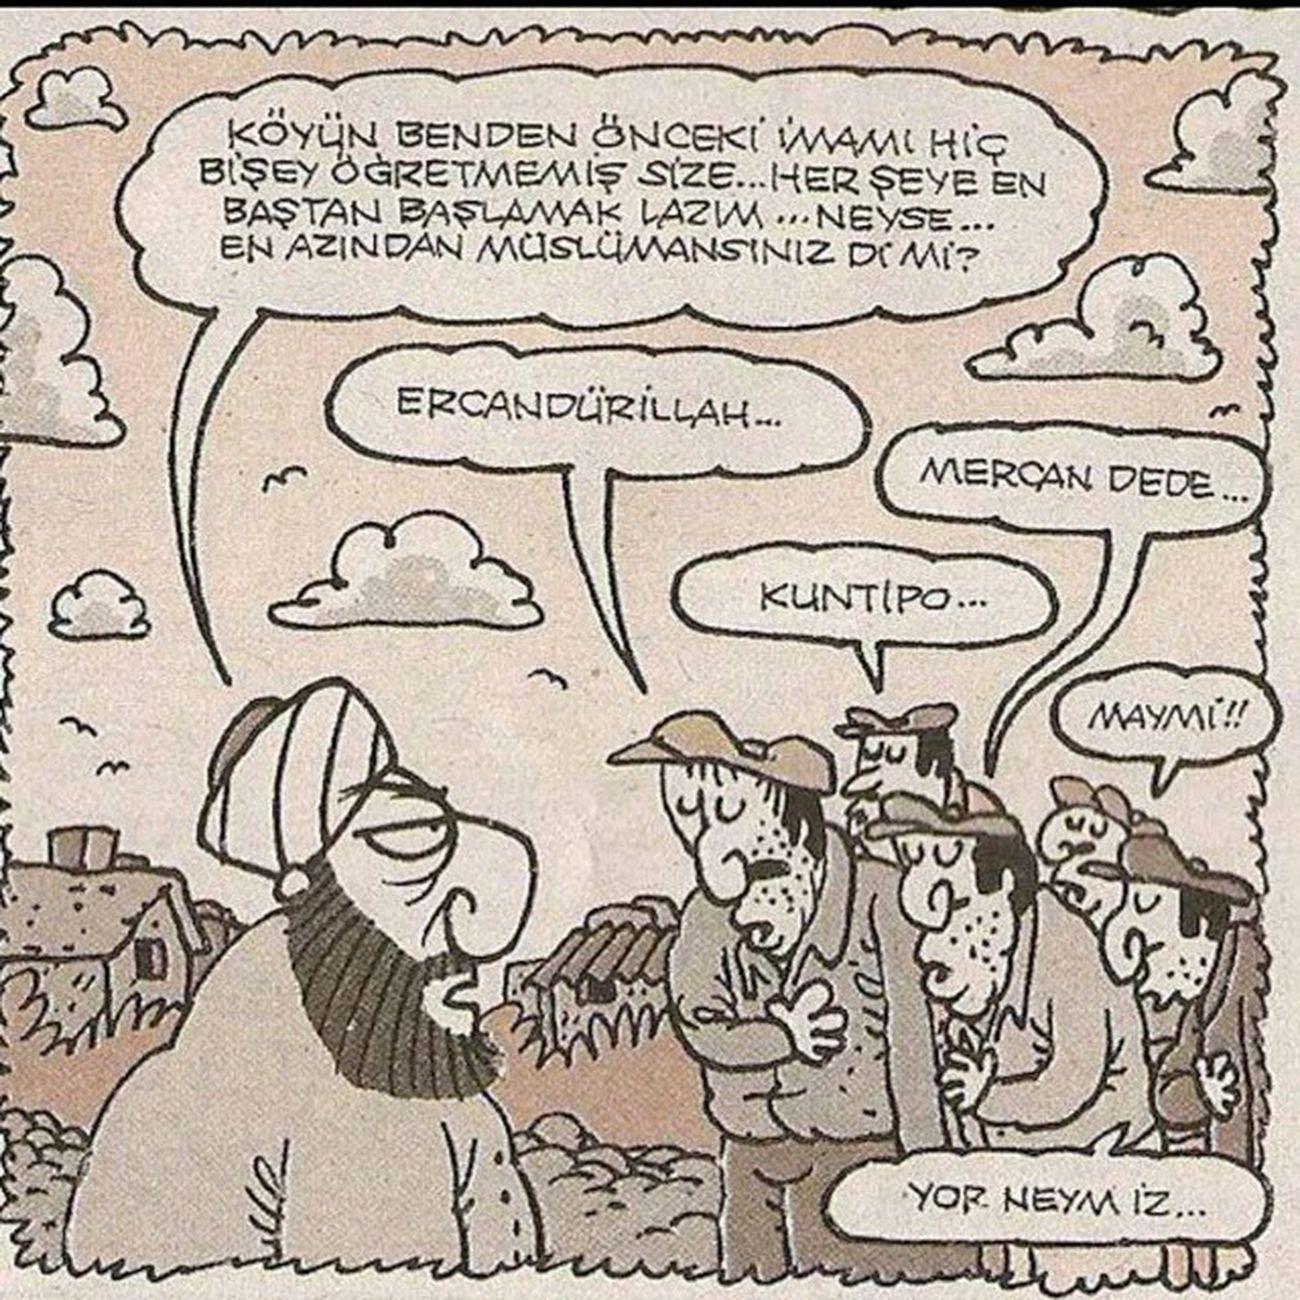 Ahaha onceki imam osurmus cemaat sicmis Estagrufrullaah Mercandede Karikatur @kolivarhacer